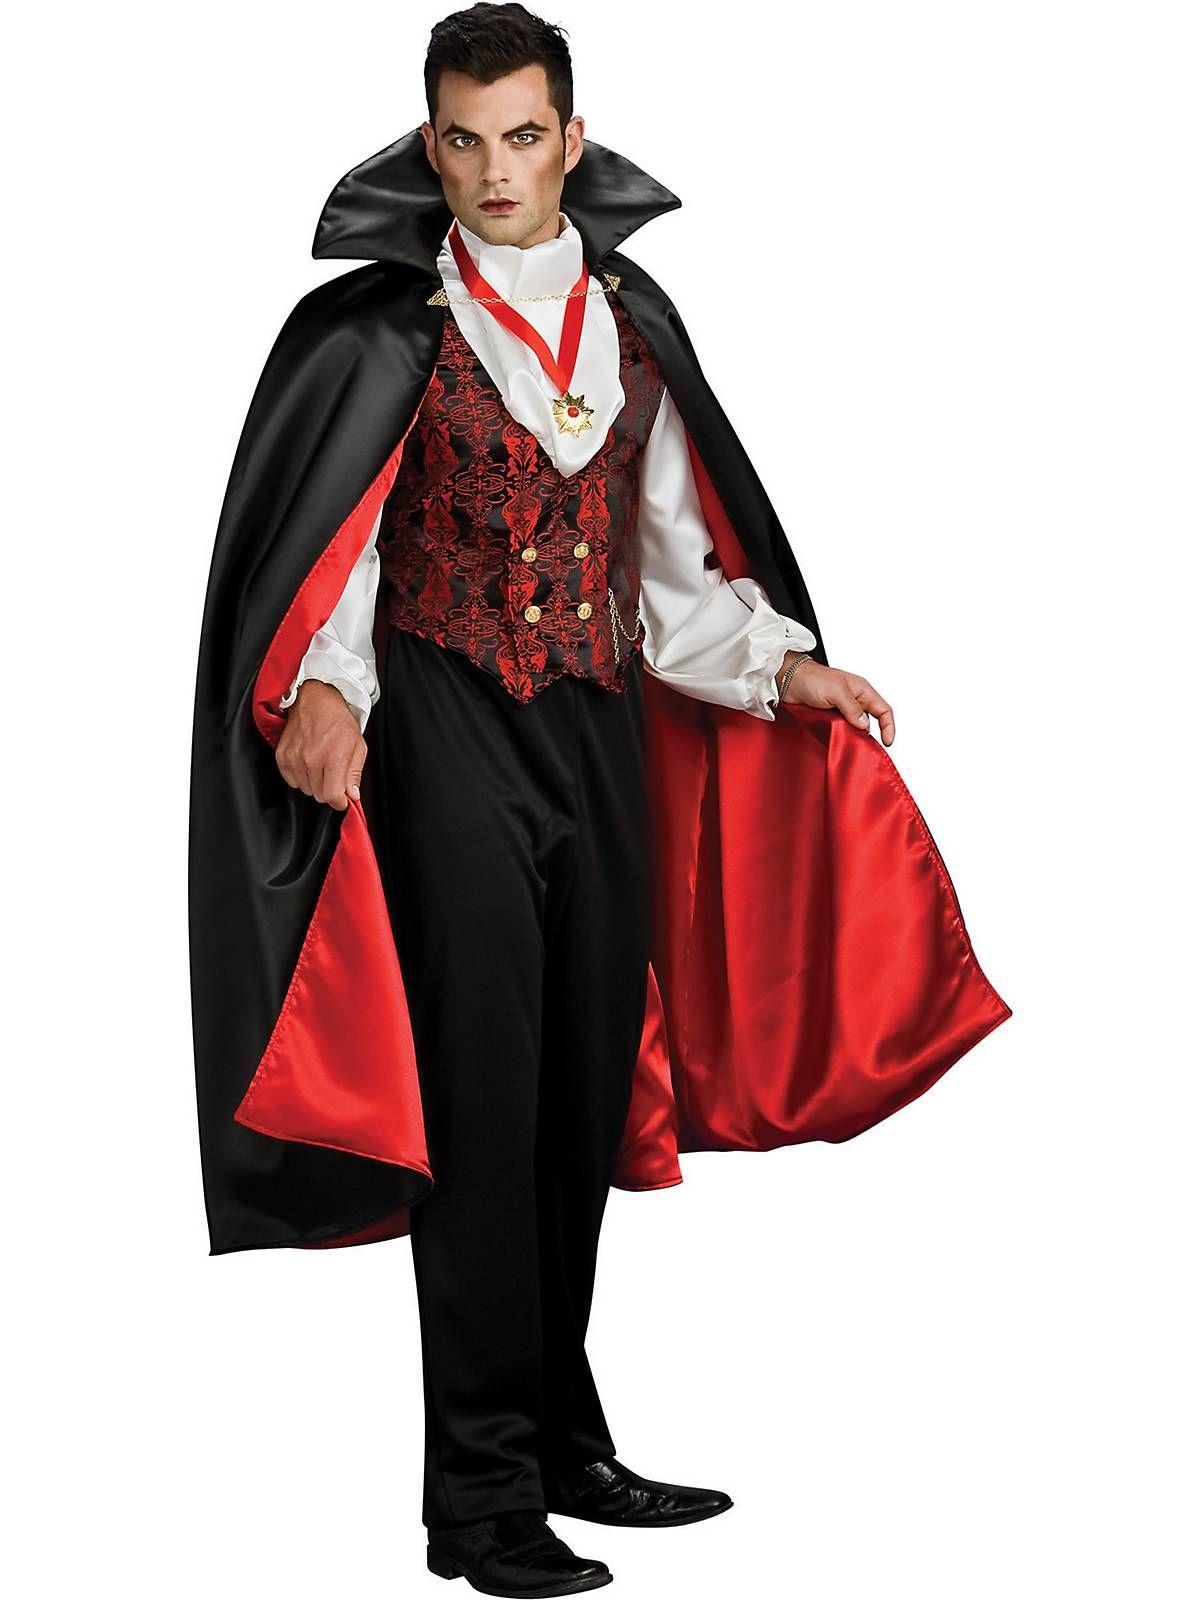 Transylvanian V&ire Costume | Mens V&ire Costumes  sc 1 st  Pinterest & Menu0027s Transylvanian Vampire Costume | Pinterest | Mens vampire ...